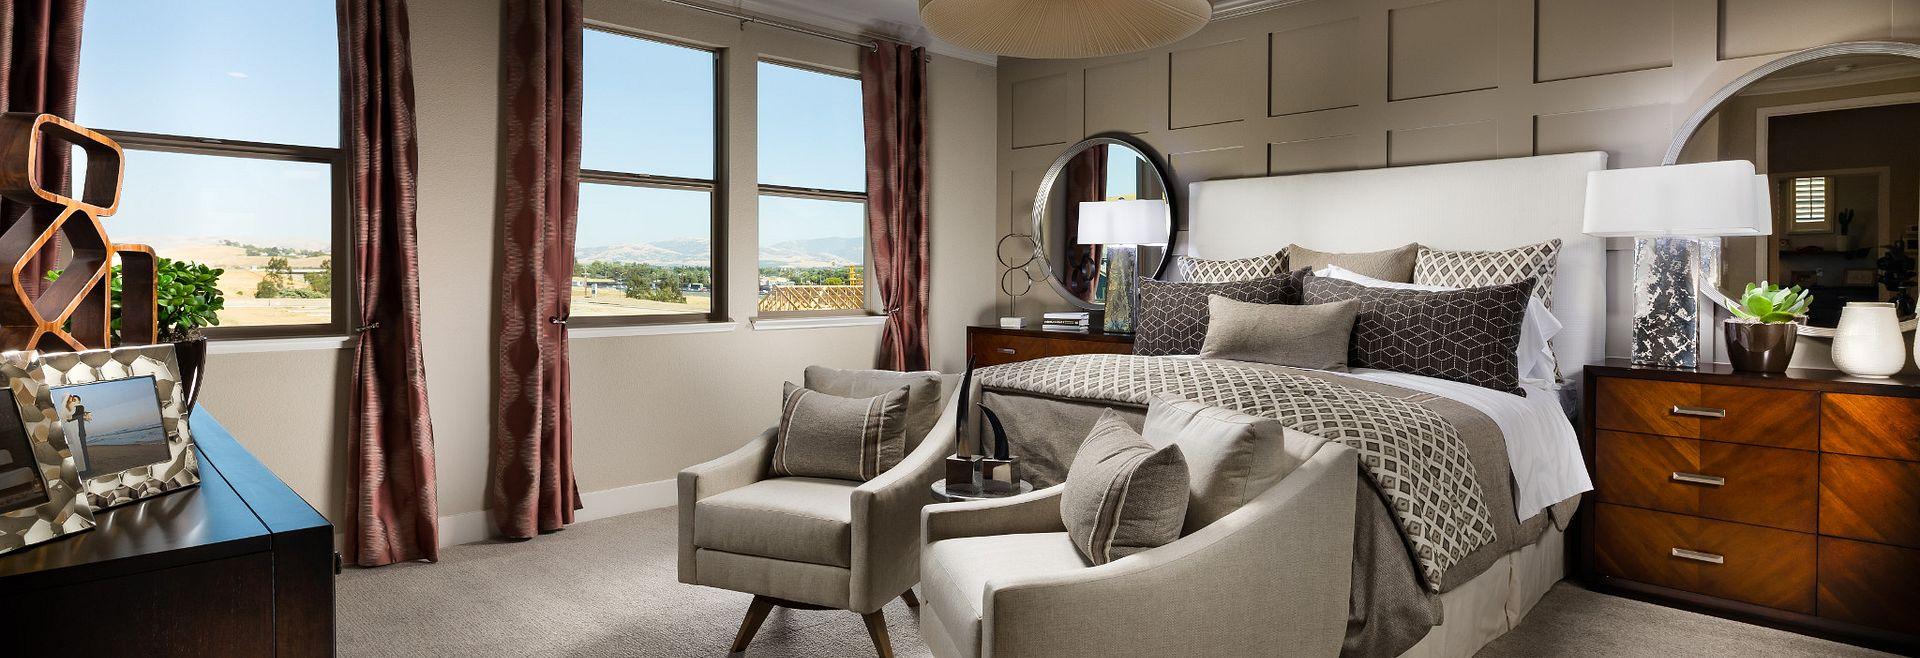 Harmony Plan 7 Sage Livermore Master Bedroom